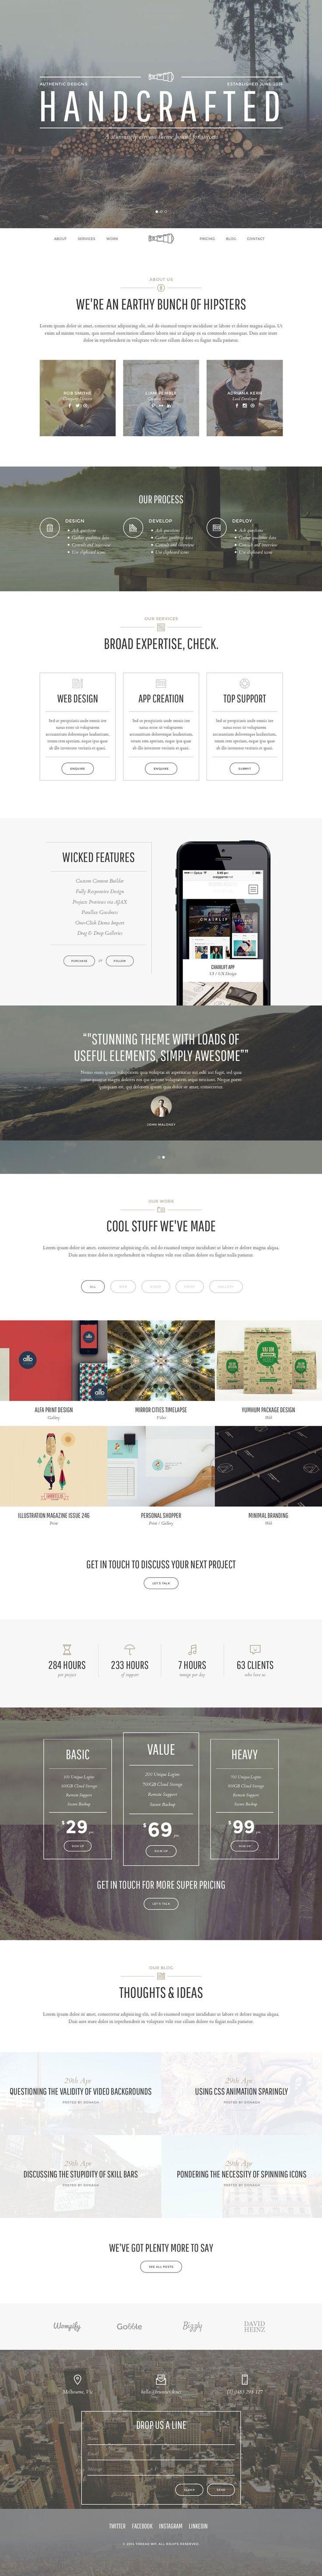 Loves Data Loves || Thread - Multi-Purpose Theme, modern vintage | Hand Made | Web design | Website | Black and White | Photography